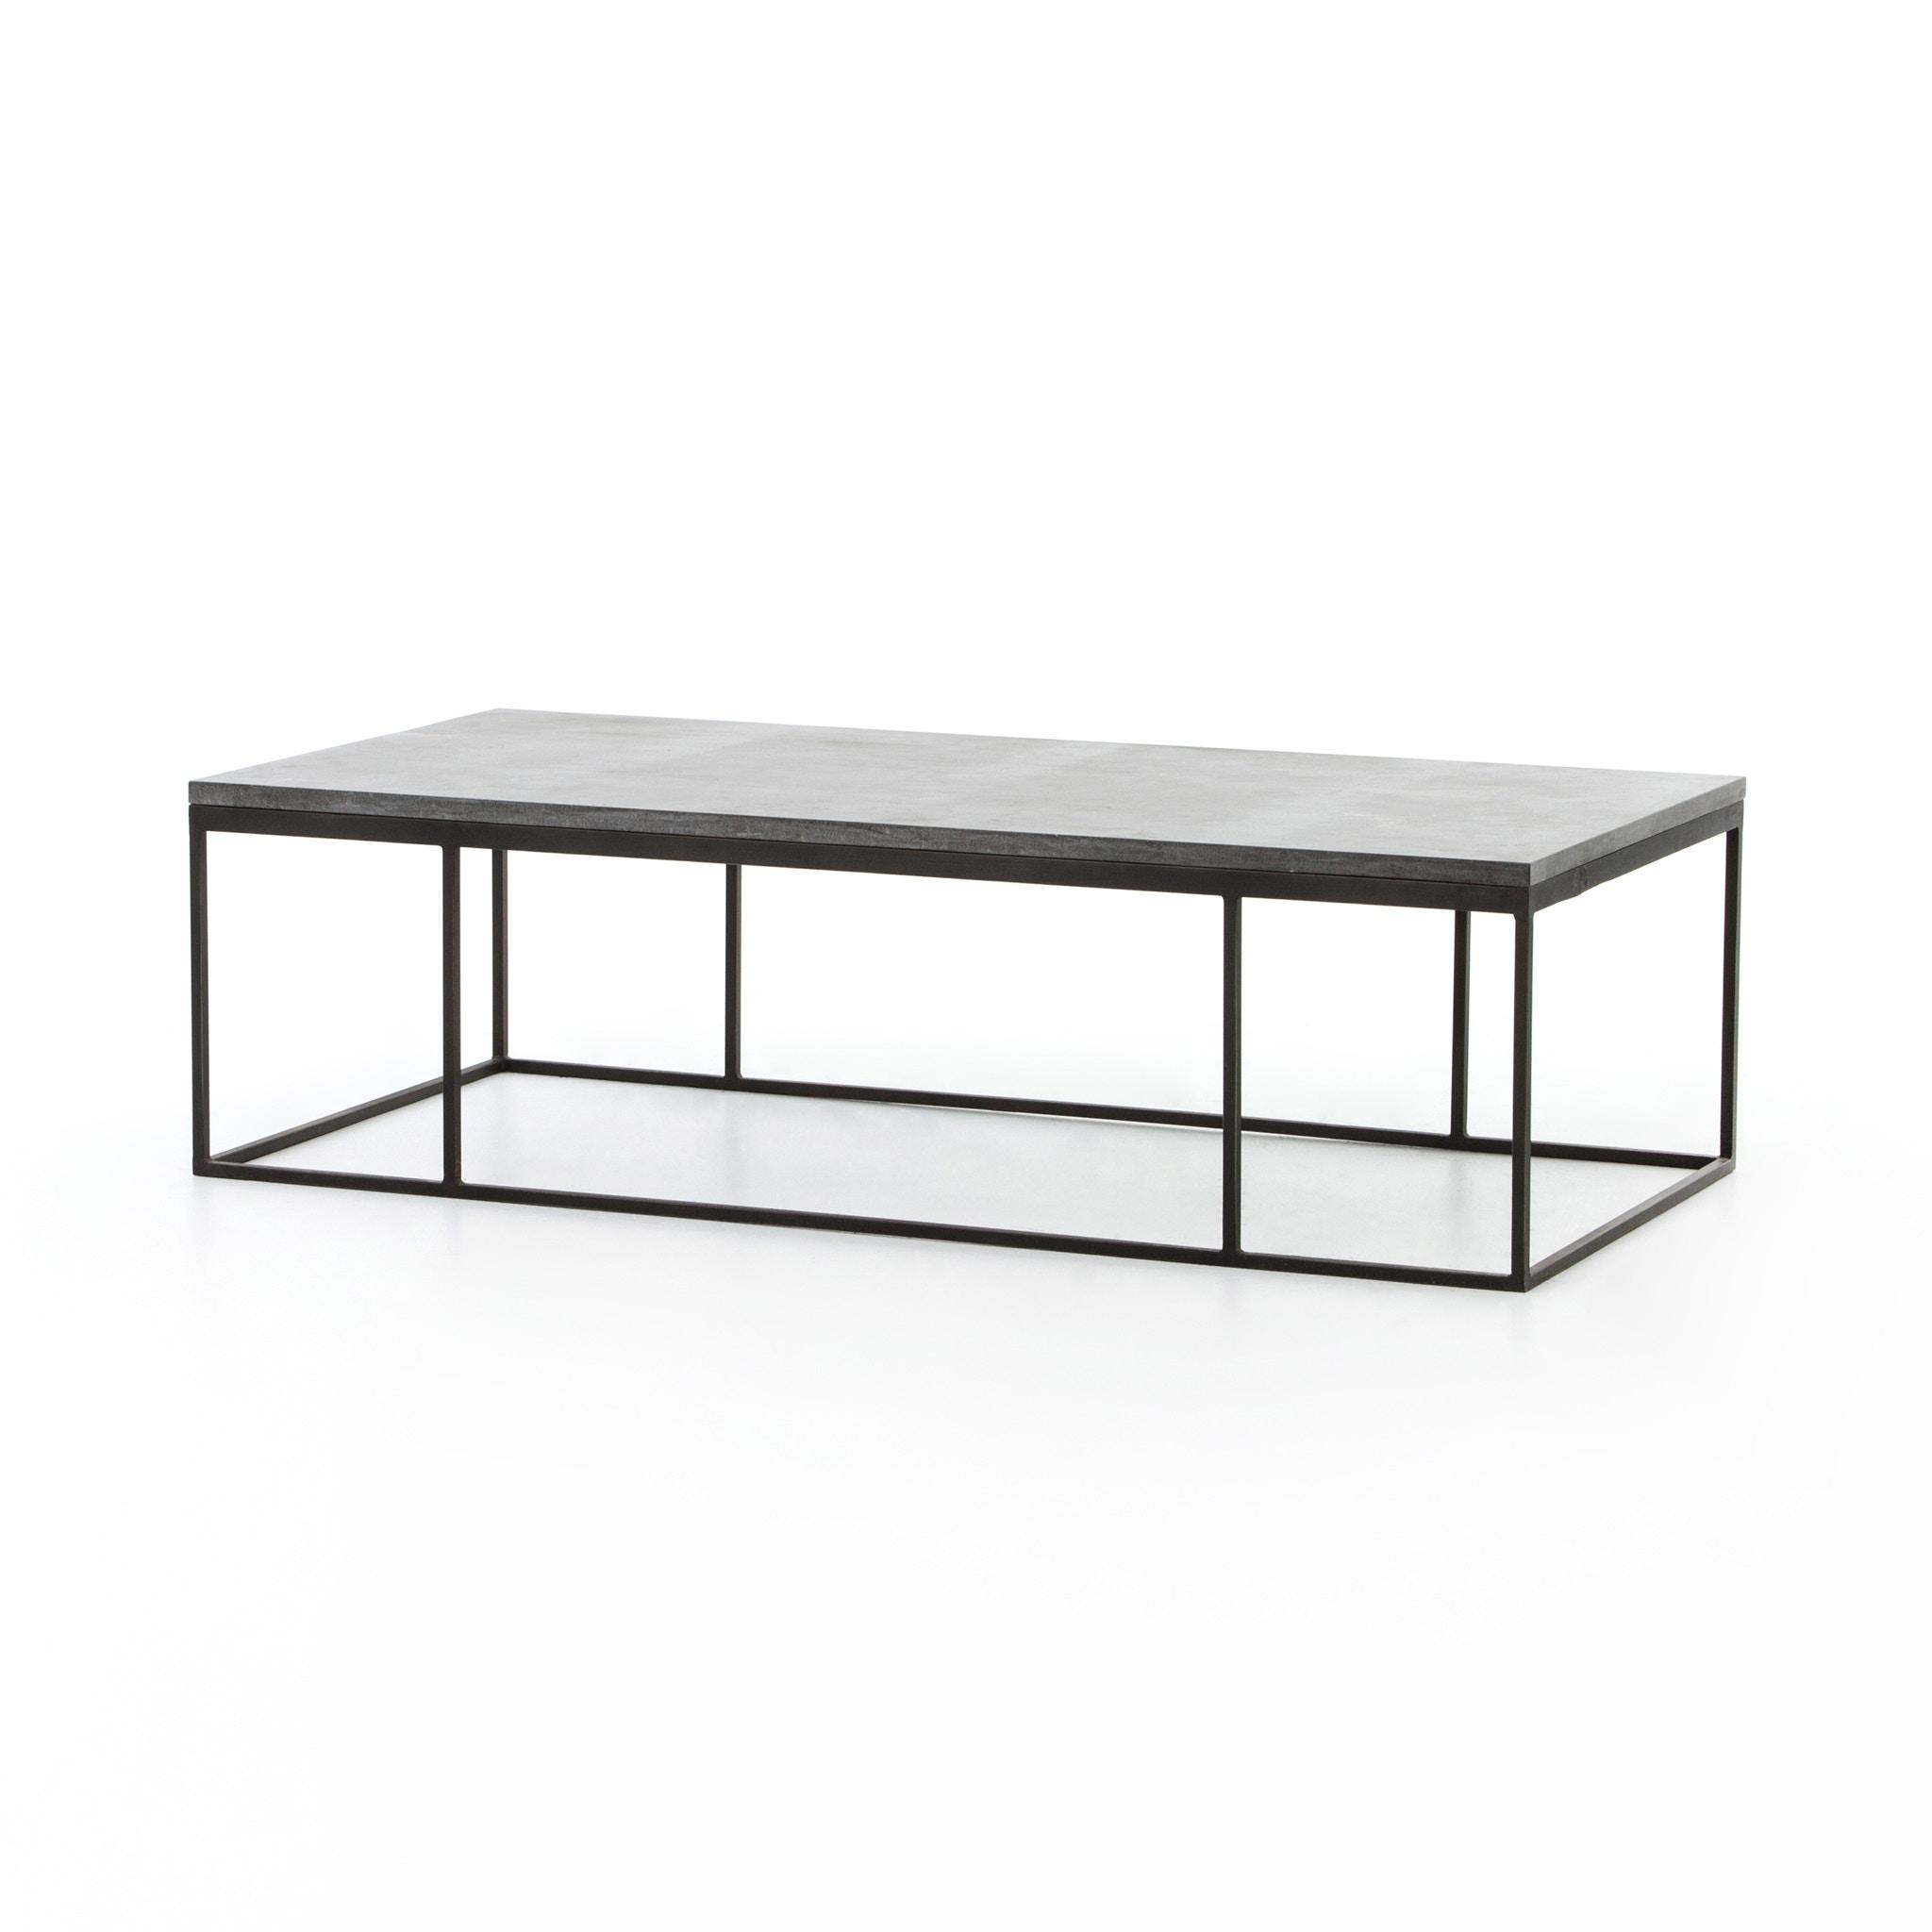 bluestone coffee table. Catalog Feature HARLOW BLUESTONE COFFEE TABLE MRCIMP10F From Walter E. Smithe Furniture + Design Bluestone Coffee Table